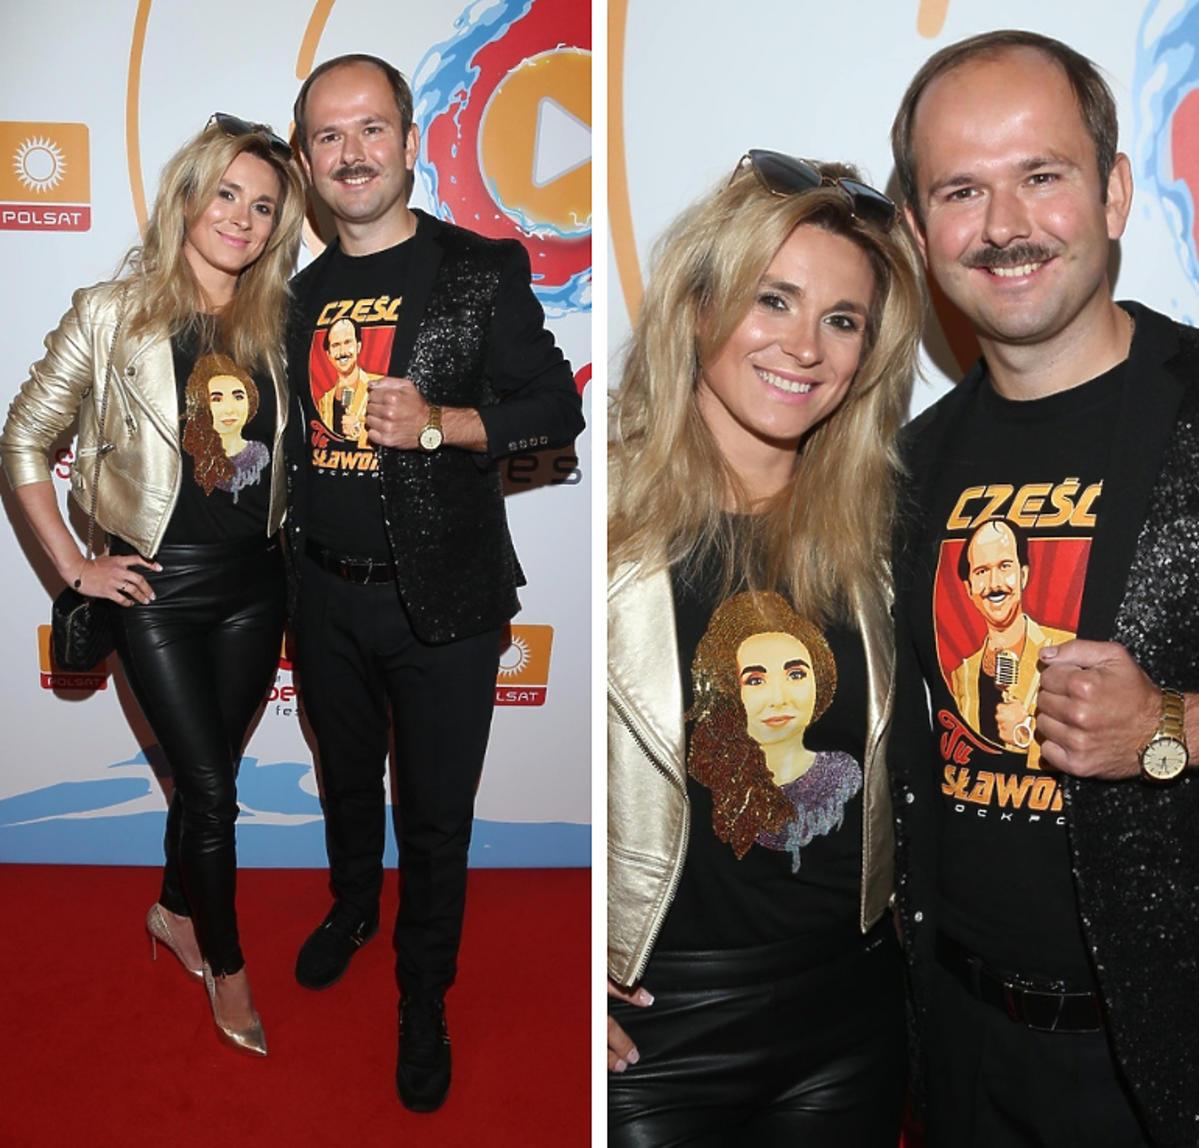 Sławomir i Kajra na konferencji Polsat SuperHit Festiwal 2019